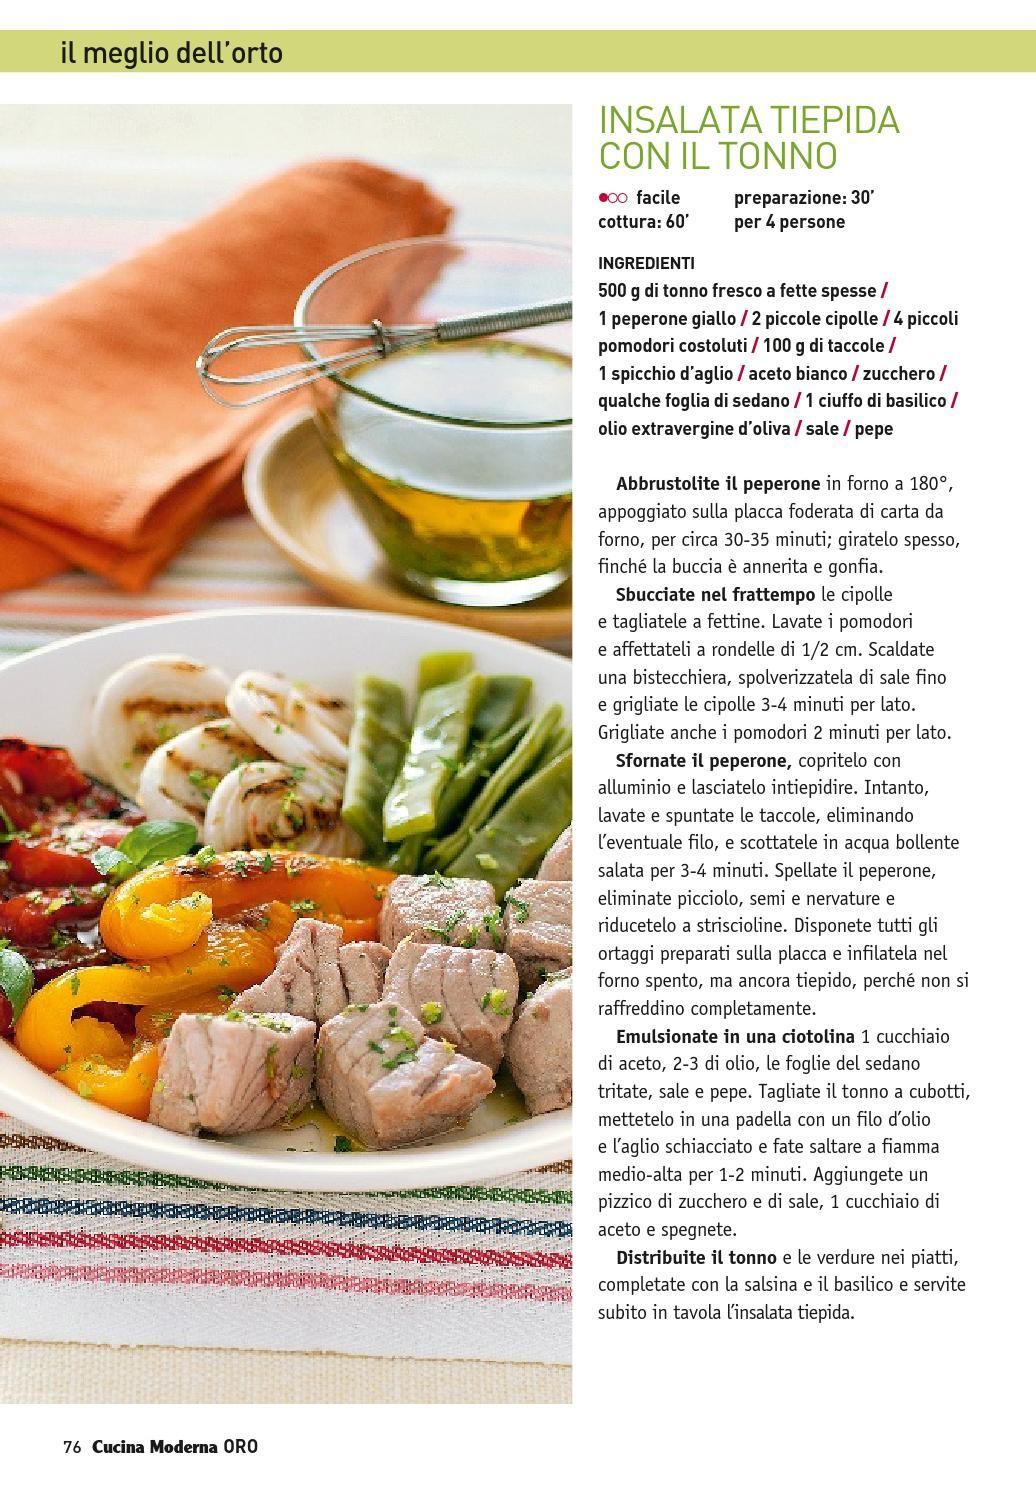 Cucina moderna oro 11 06 2015 by m@r by marco Ar - issuu